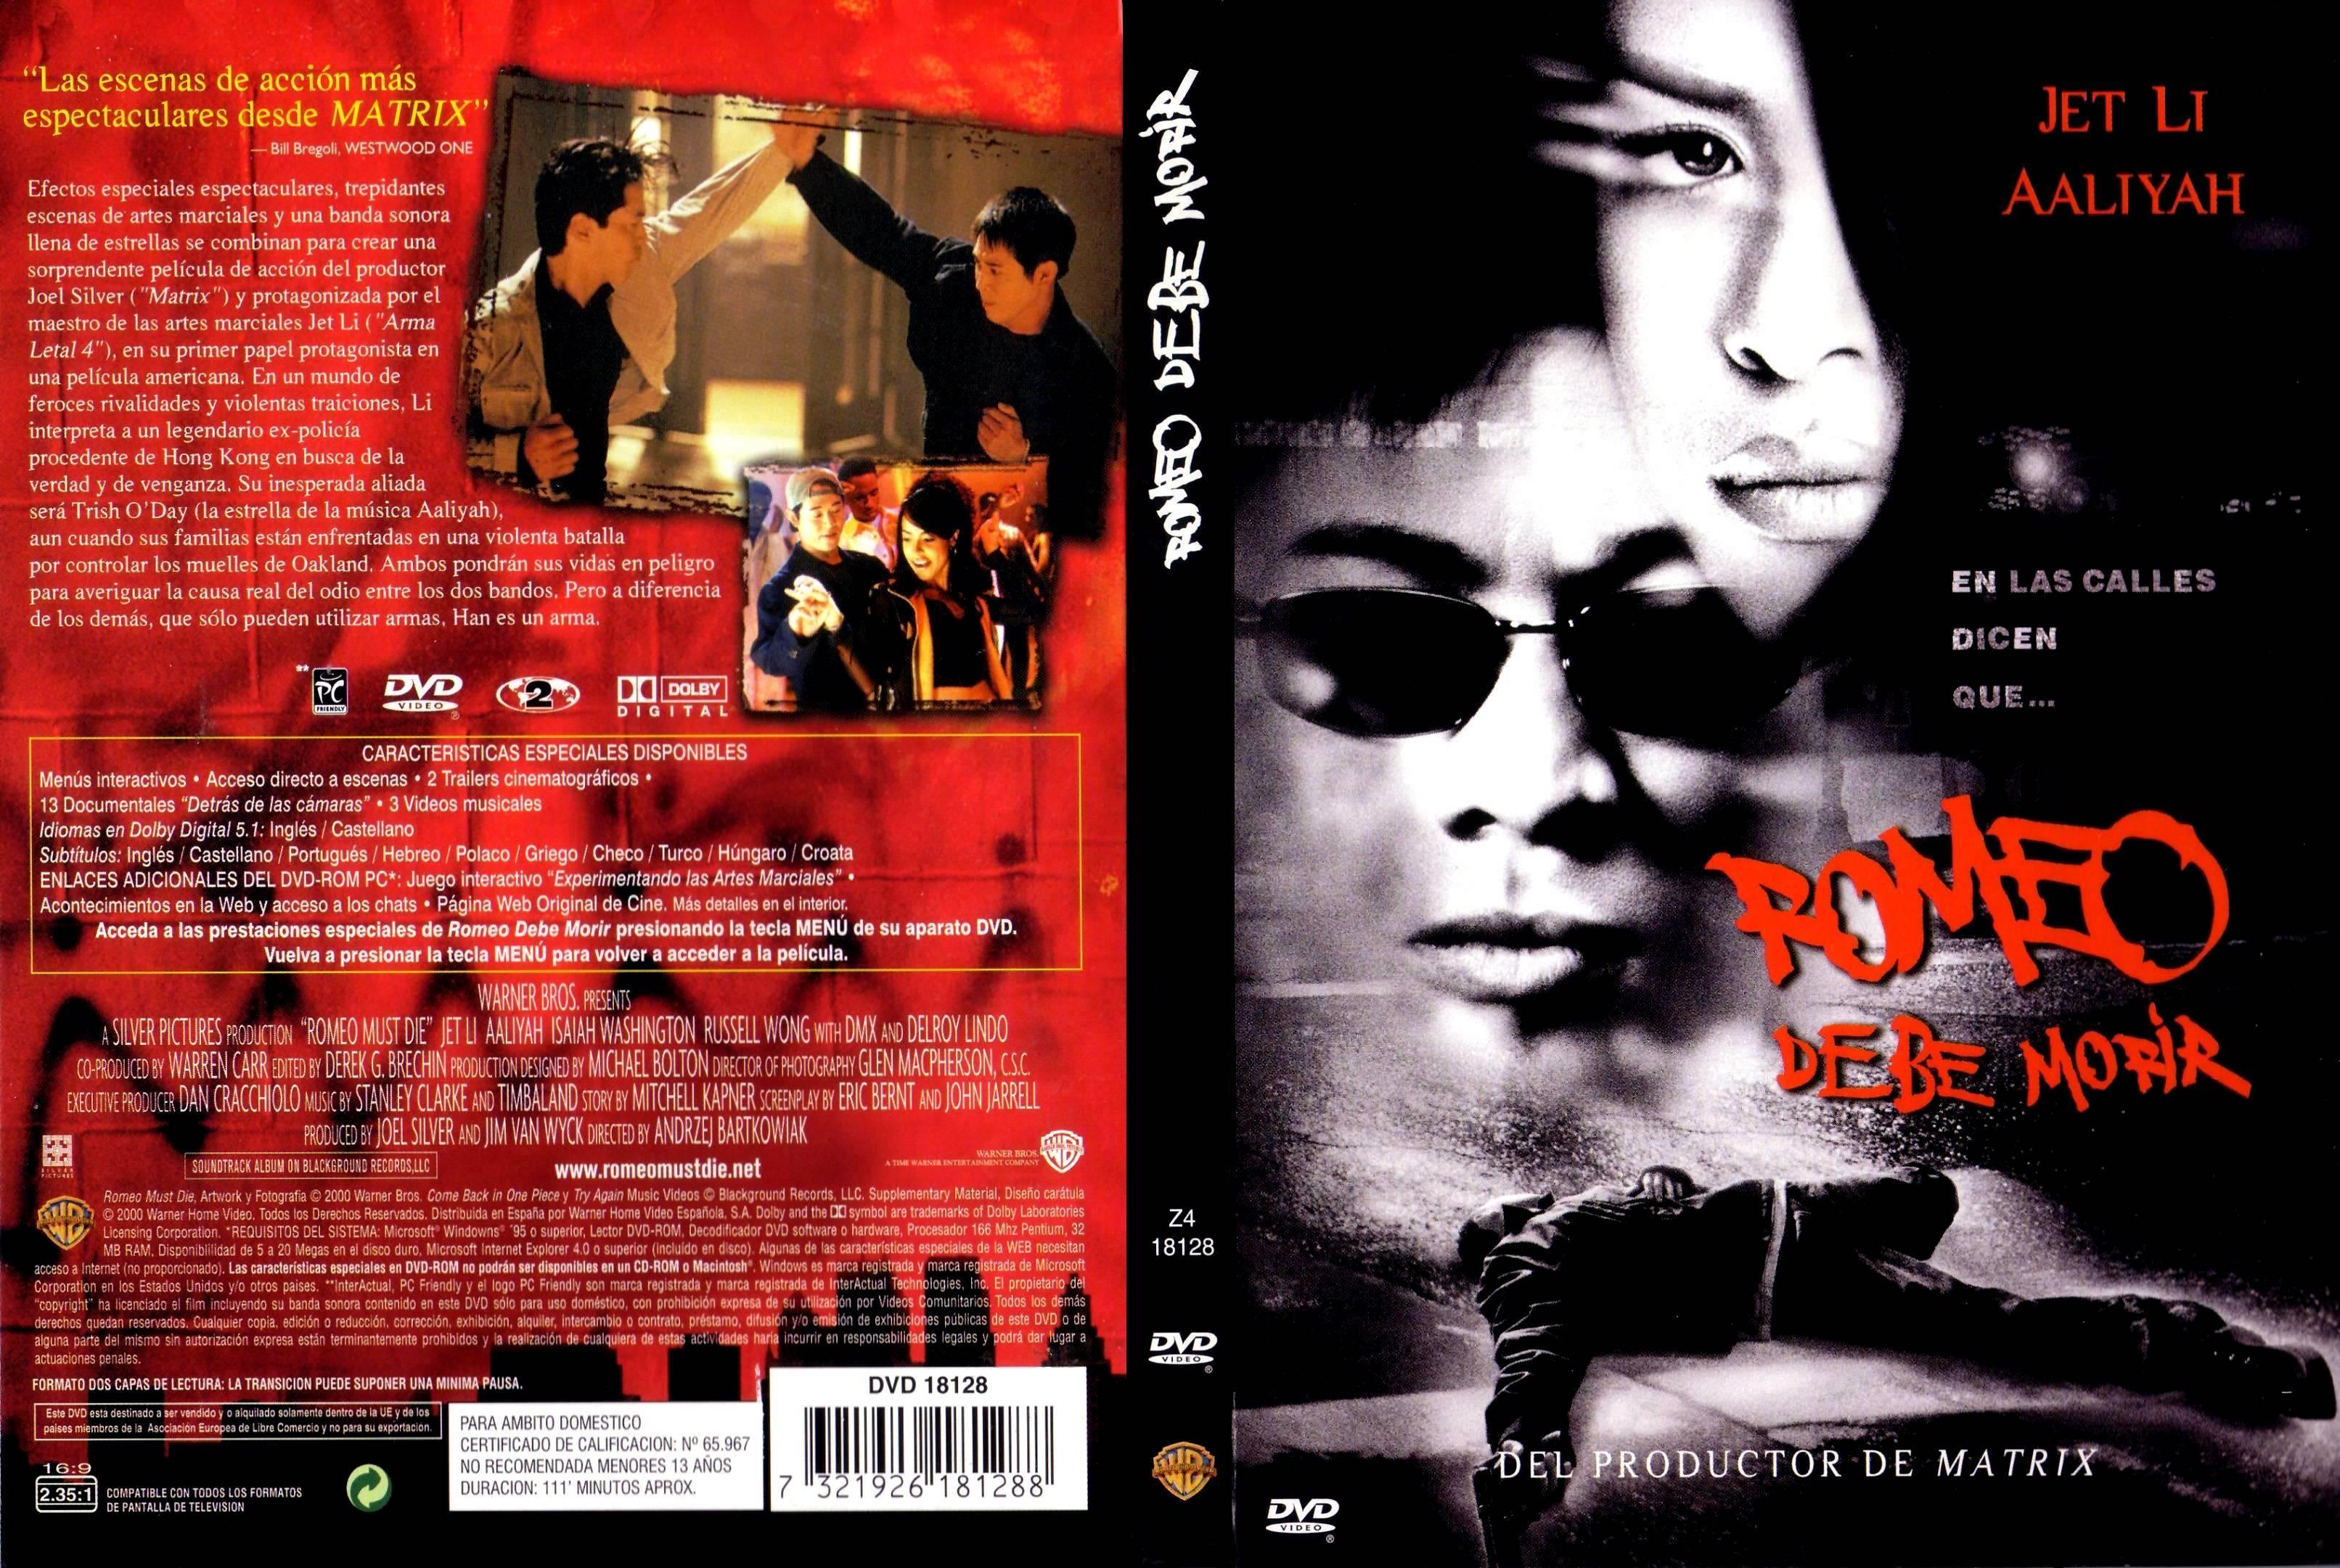 Romeo Debe Morir|Jet Li|2000|1080p|Latino